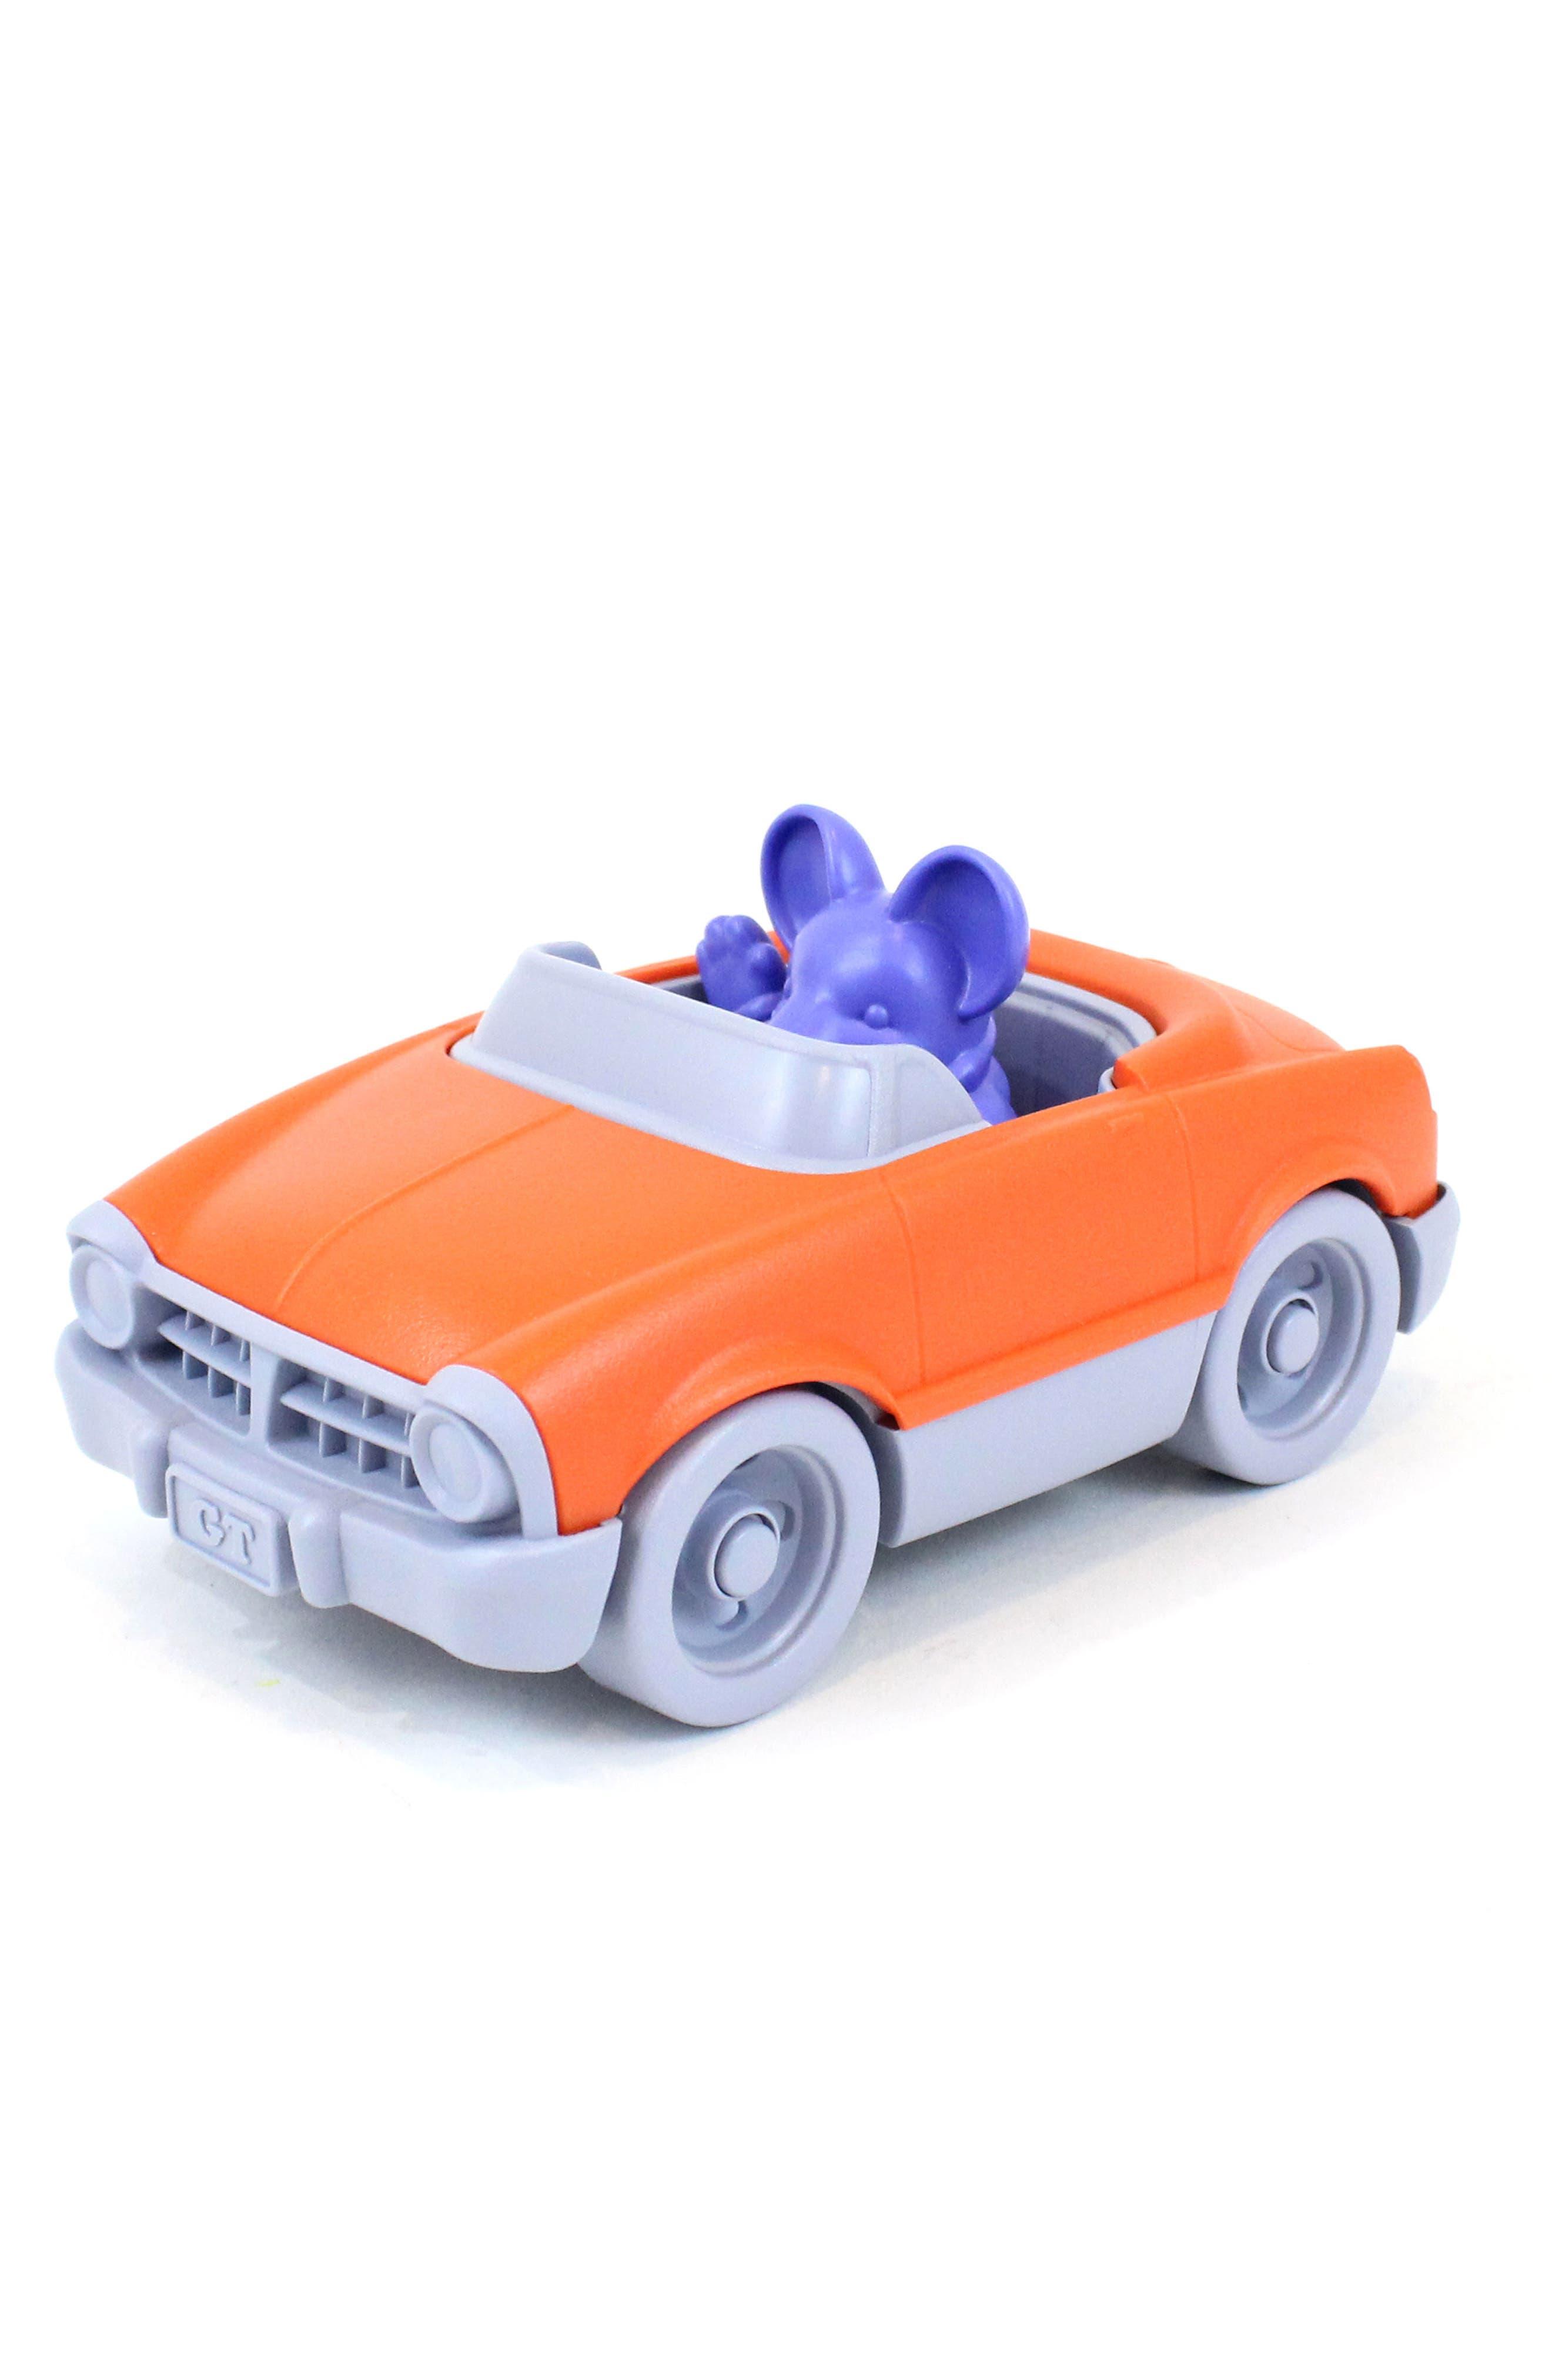 Two-Piece Convertible Car Toy,                             Alternate thumbnail 2, color,                             Orange